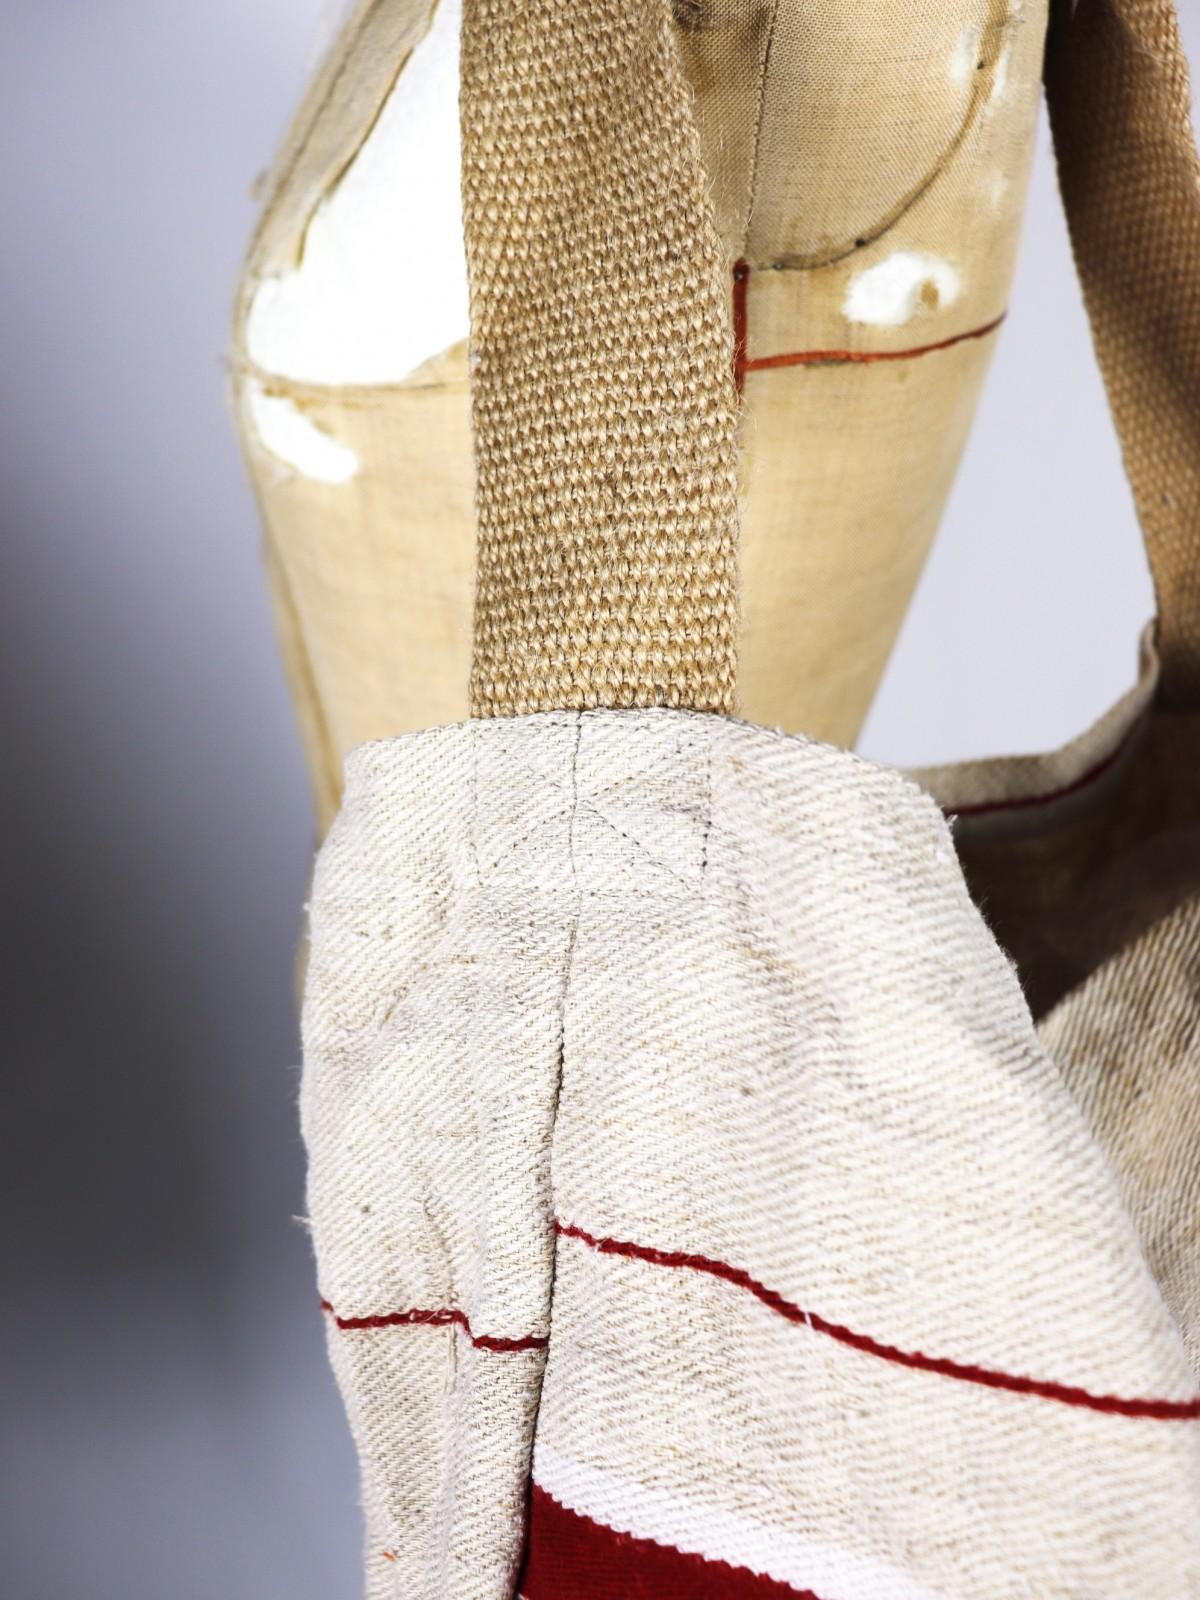 Hungarian grain sack, Brown,remake, Bag